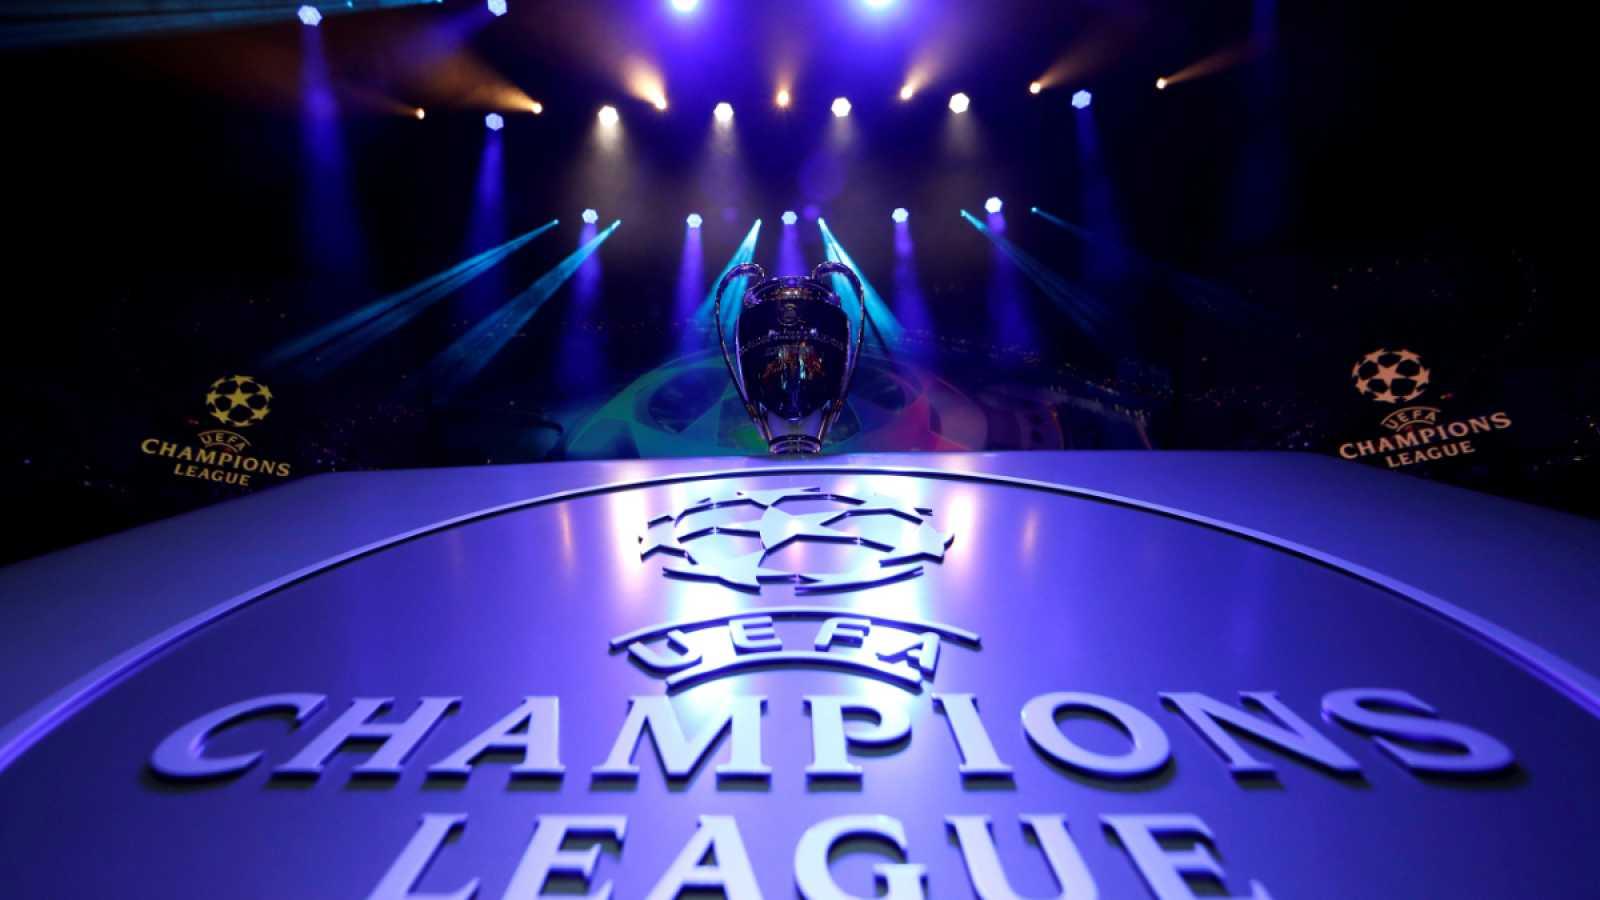 Imagen: El trofeo de la UEFA Champions League